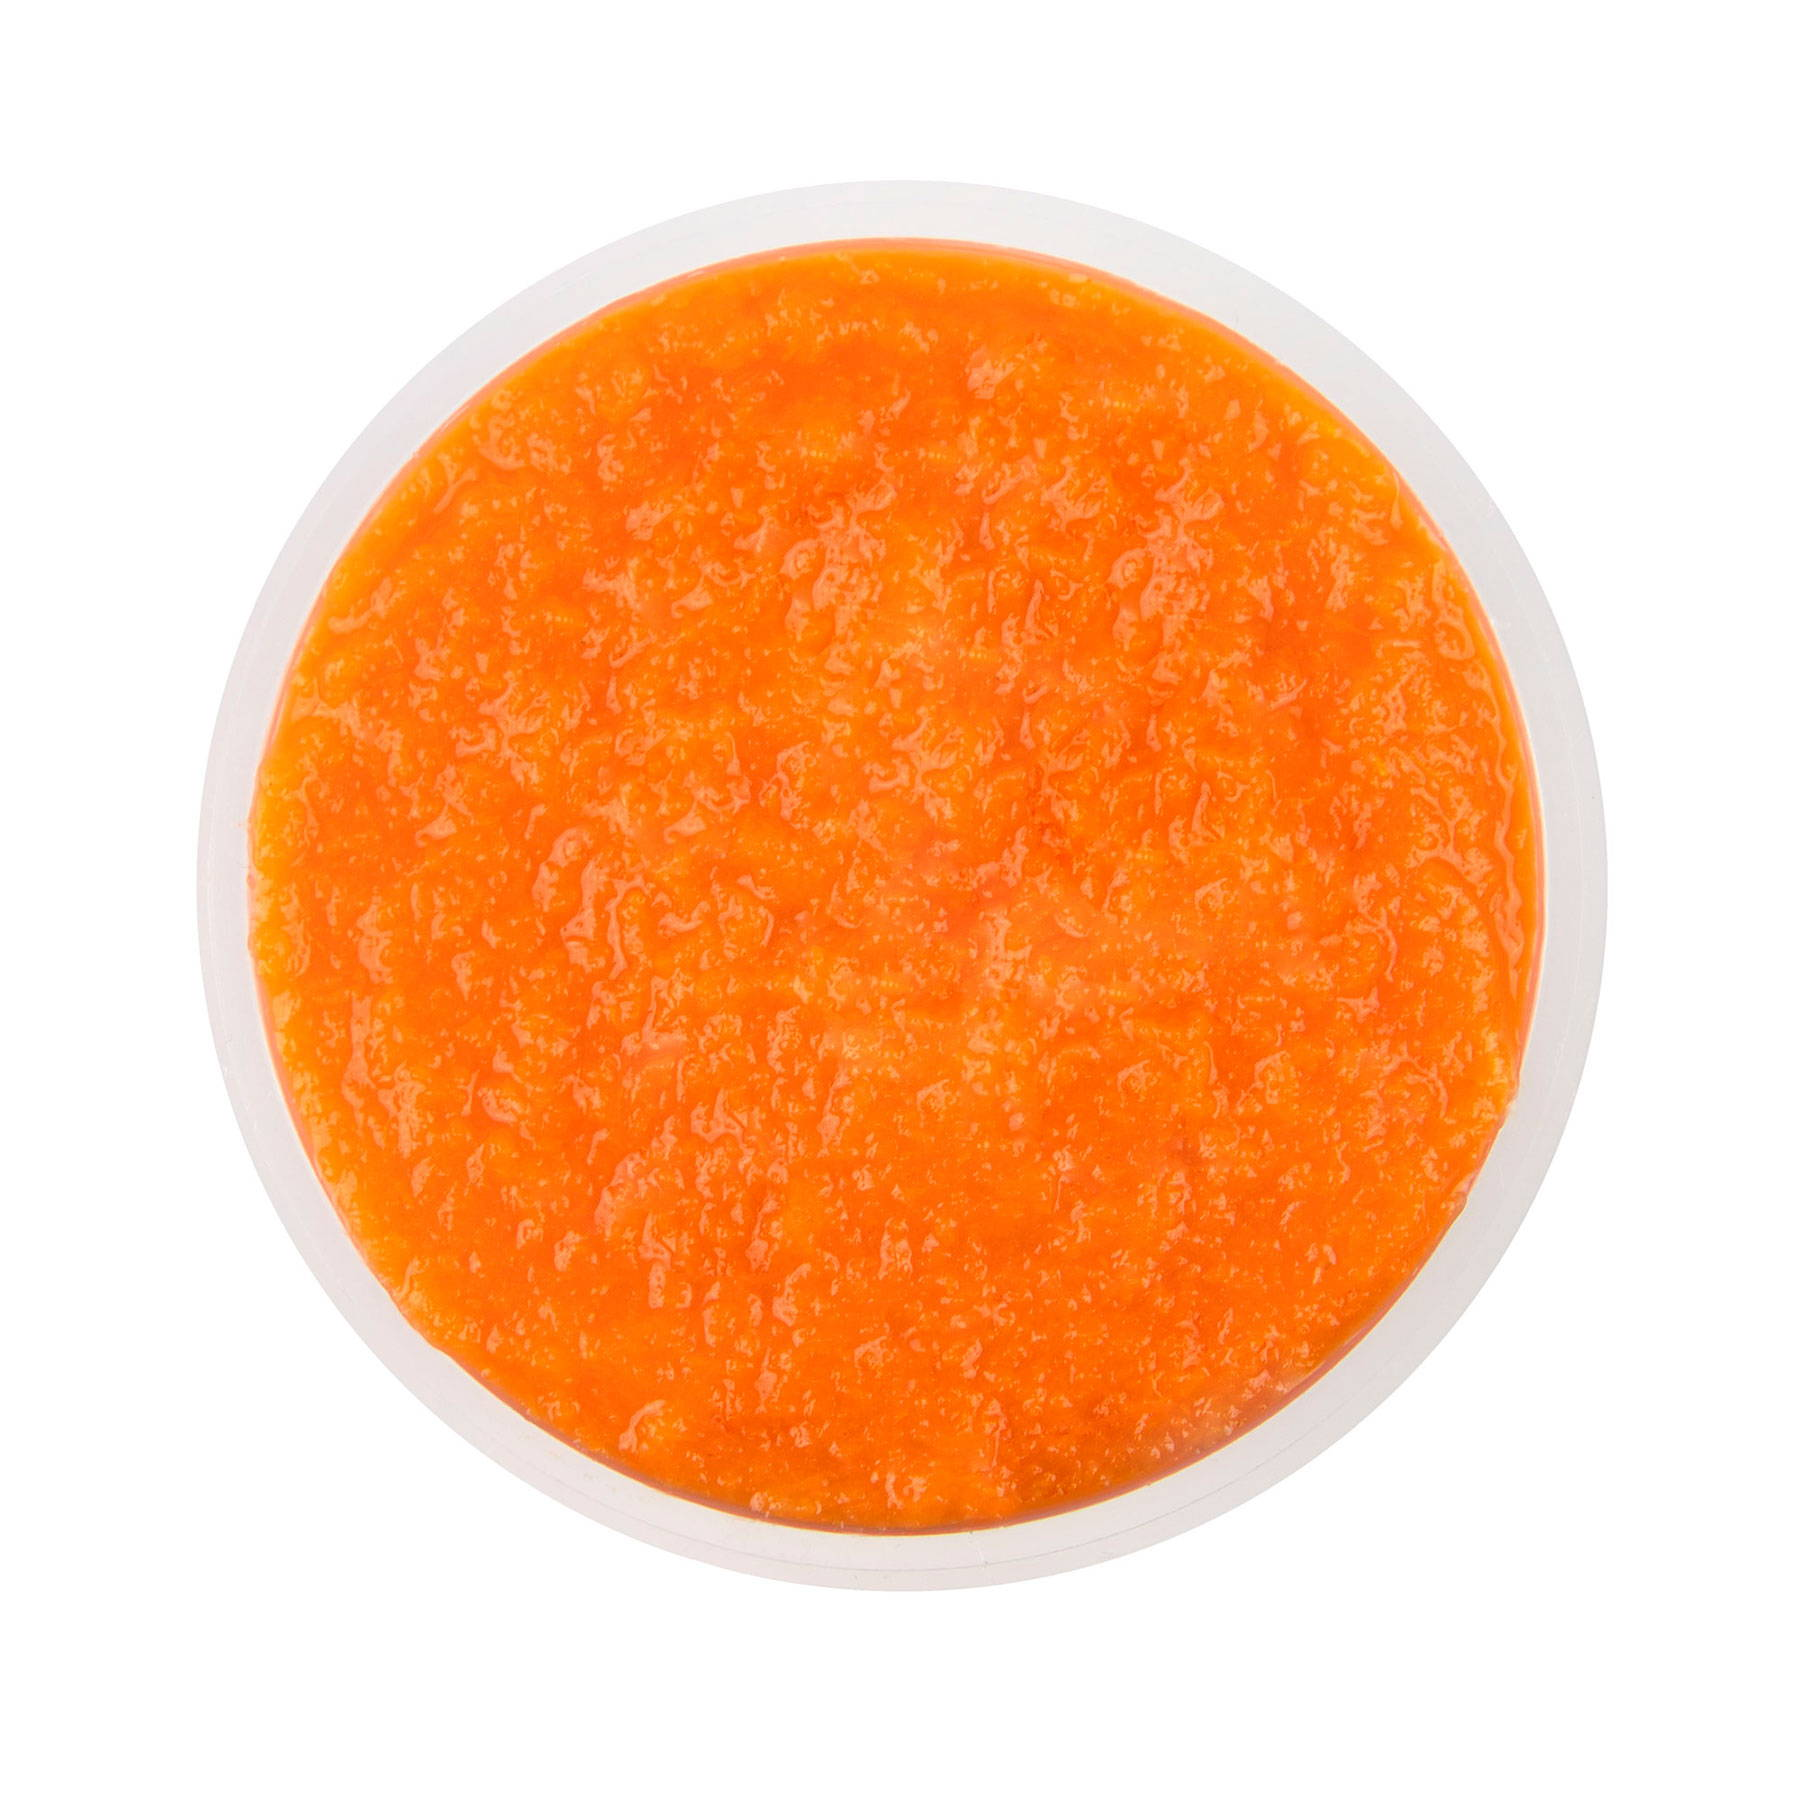 Karotte & Mango